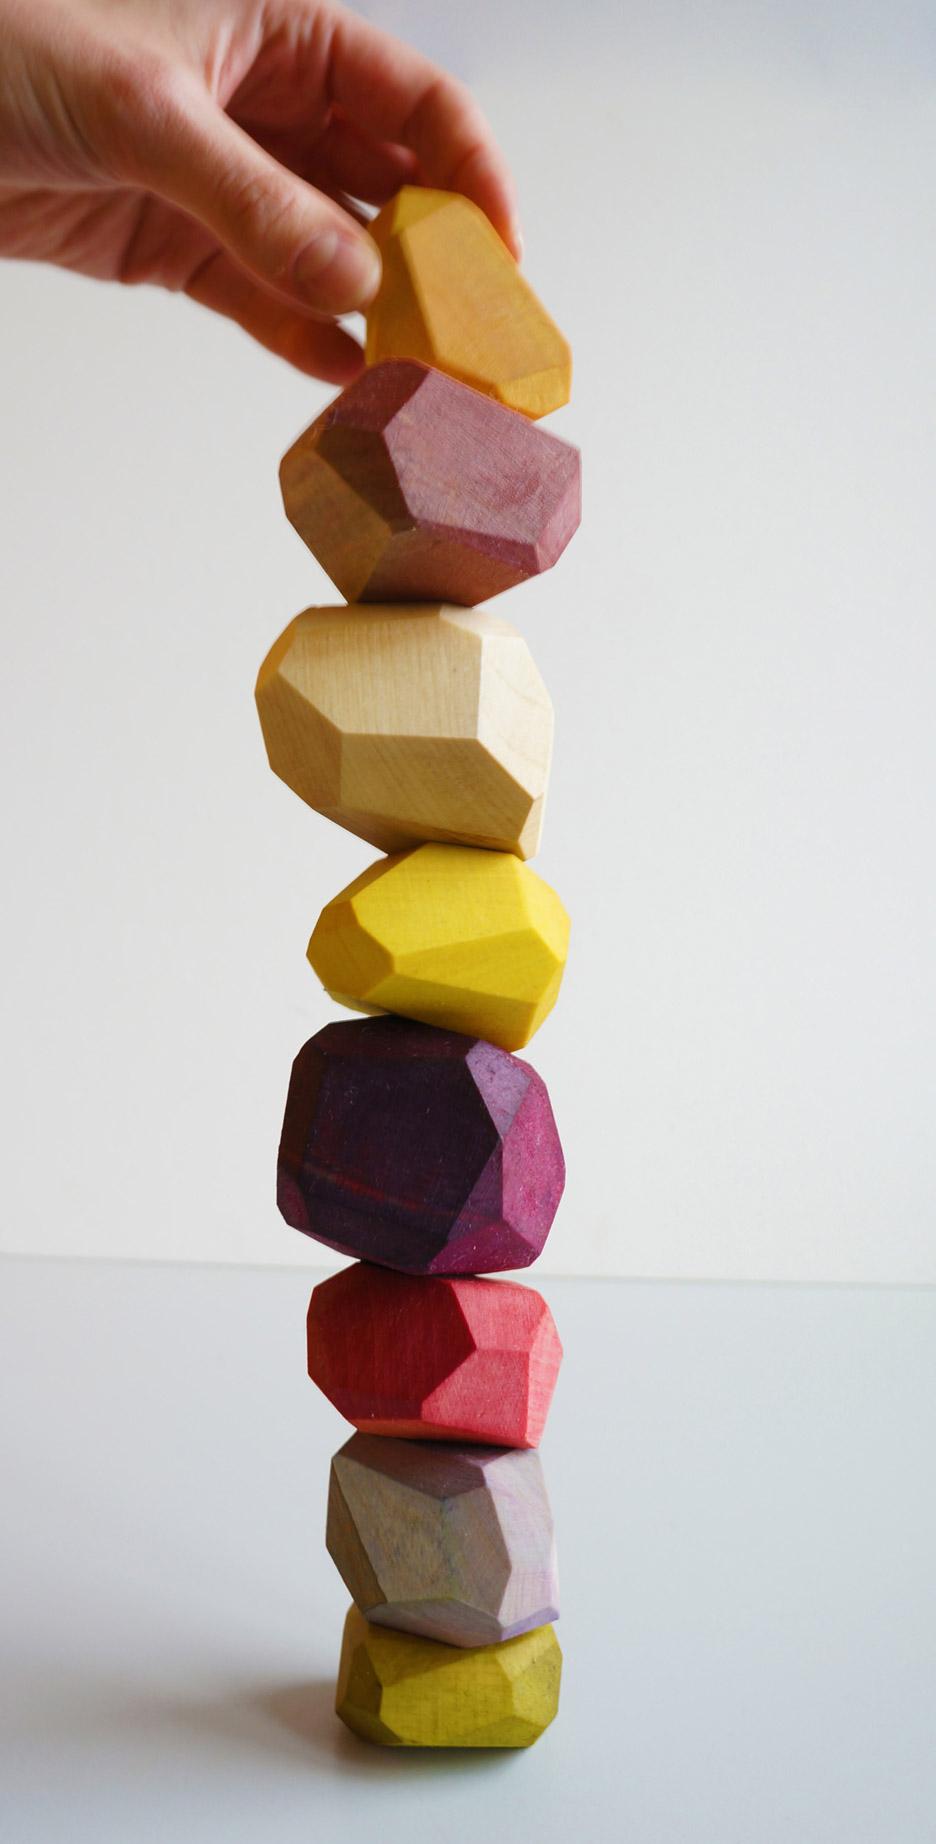 Katarina_Hornwall-Gabriella_Rubin-Snego-building-blocks-hisheji (6)